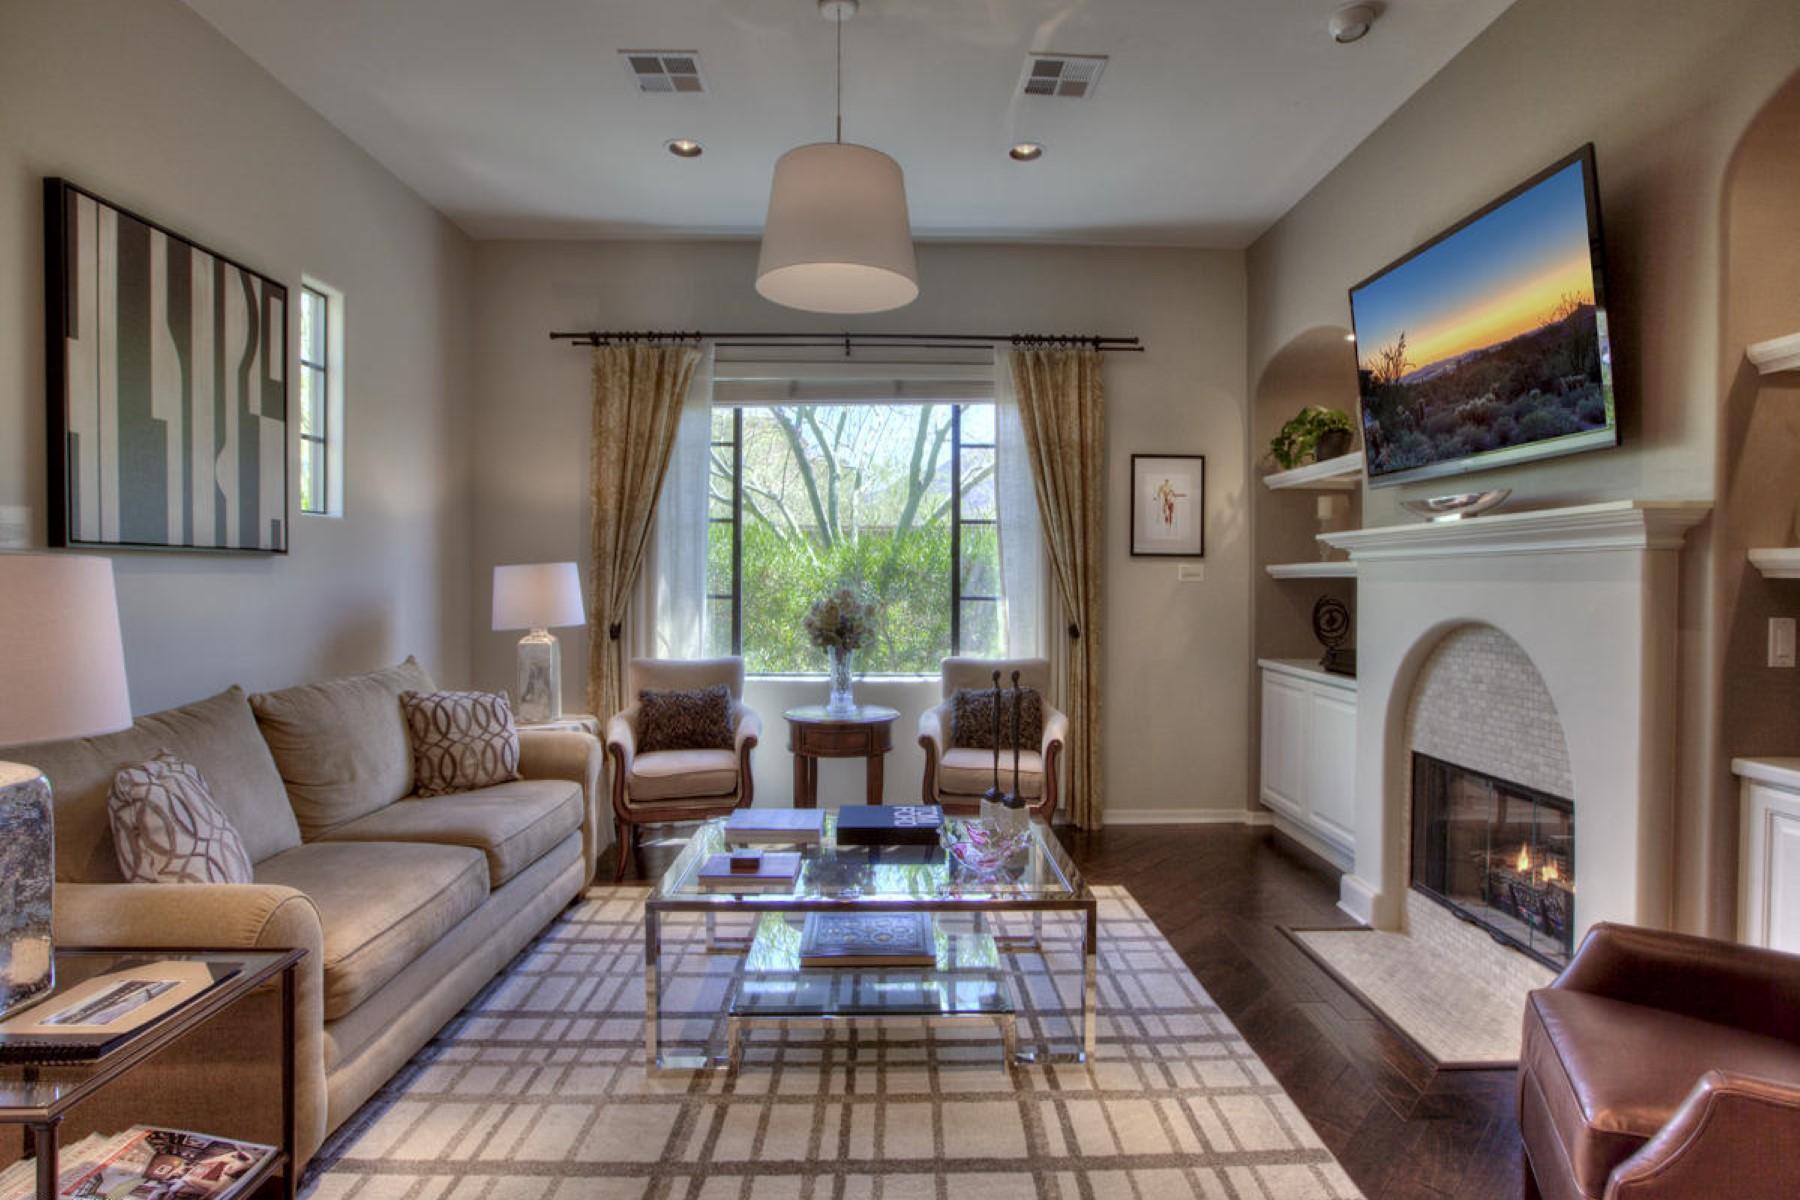 Residência urbana para Venda às Exceptional DC Ranch Courtyard home 18650 N THOMPSON PEAK PKWY 1041 Scottsdale, Arizona, 85255 Estados Unidos